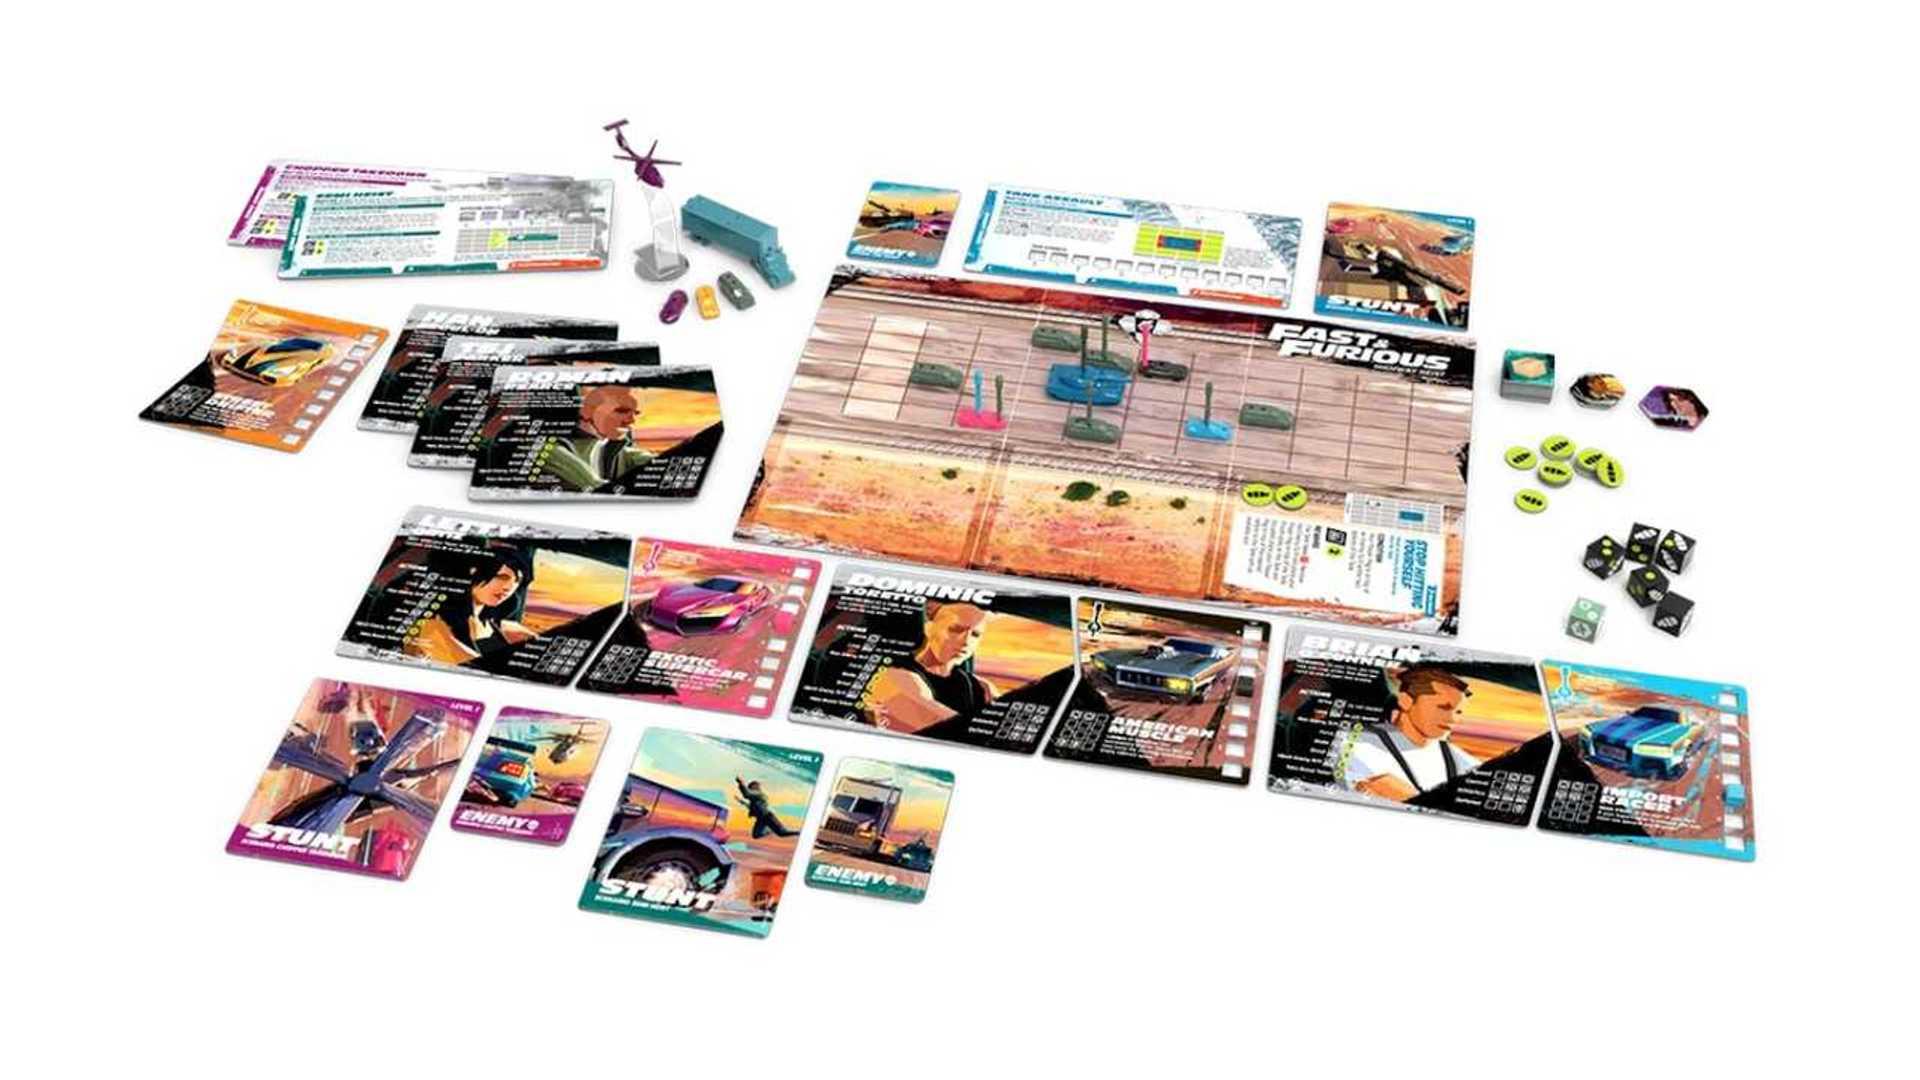 https://cdn.motor1.com/images/mgl/KLzLb/s6/fast-furious-highway-heist-board-game.jpg